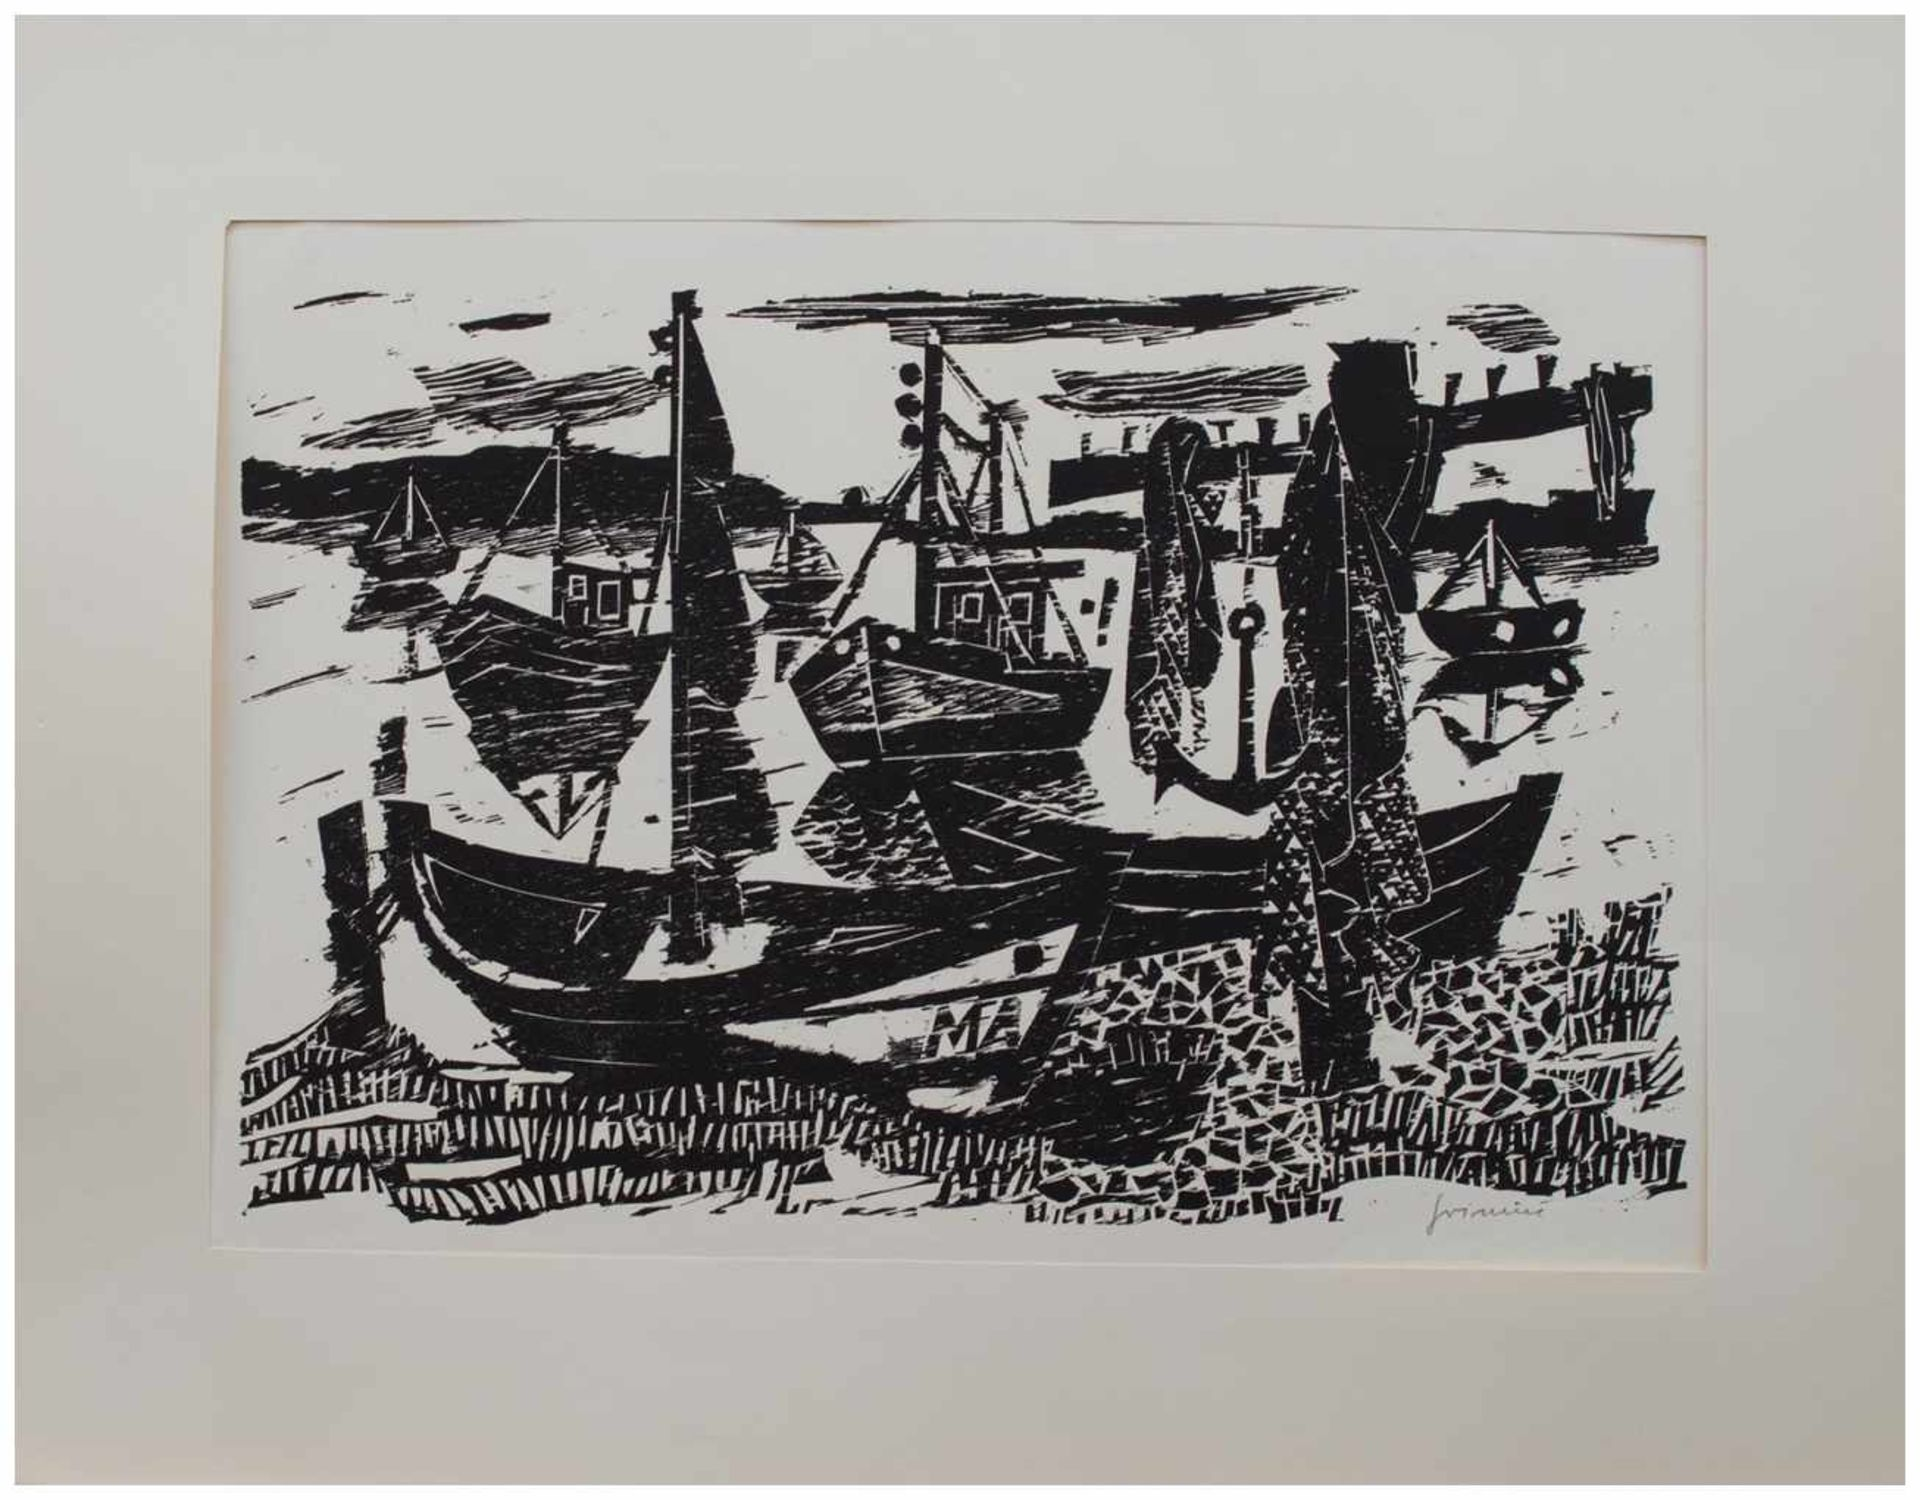 Los 36 - Wilhelm Grimm (Eberstadt 1904 - 1986 Hamburg, deutscher Maler u. Grafiker, Std. a.d. Werkkunstschule